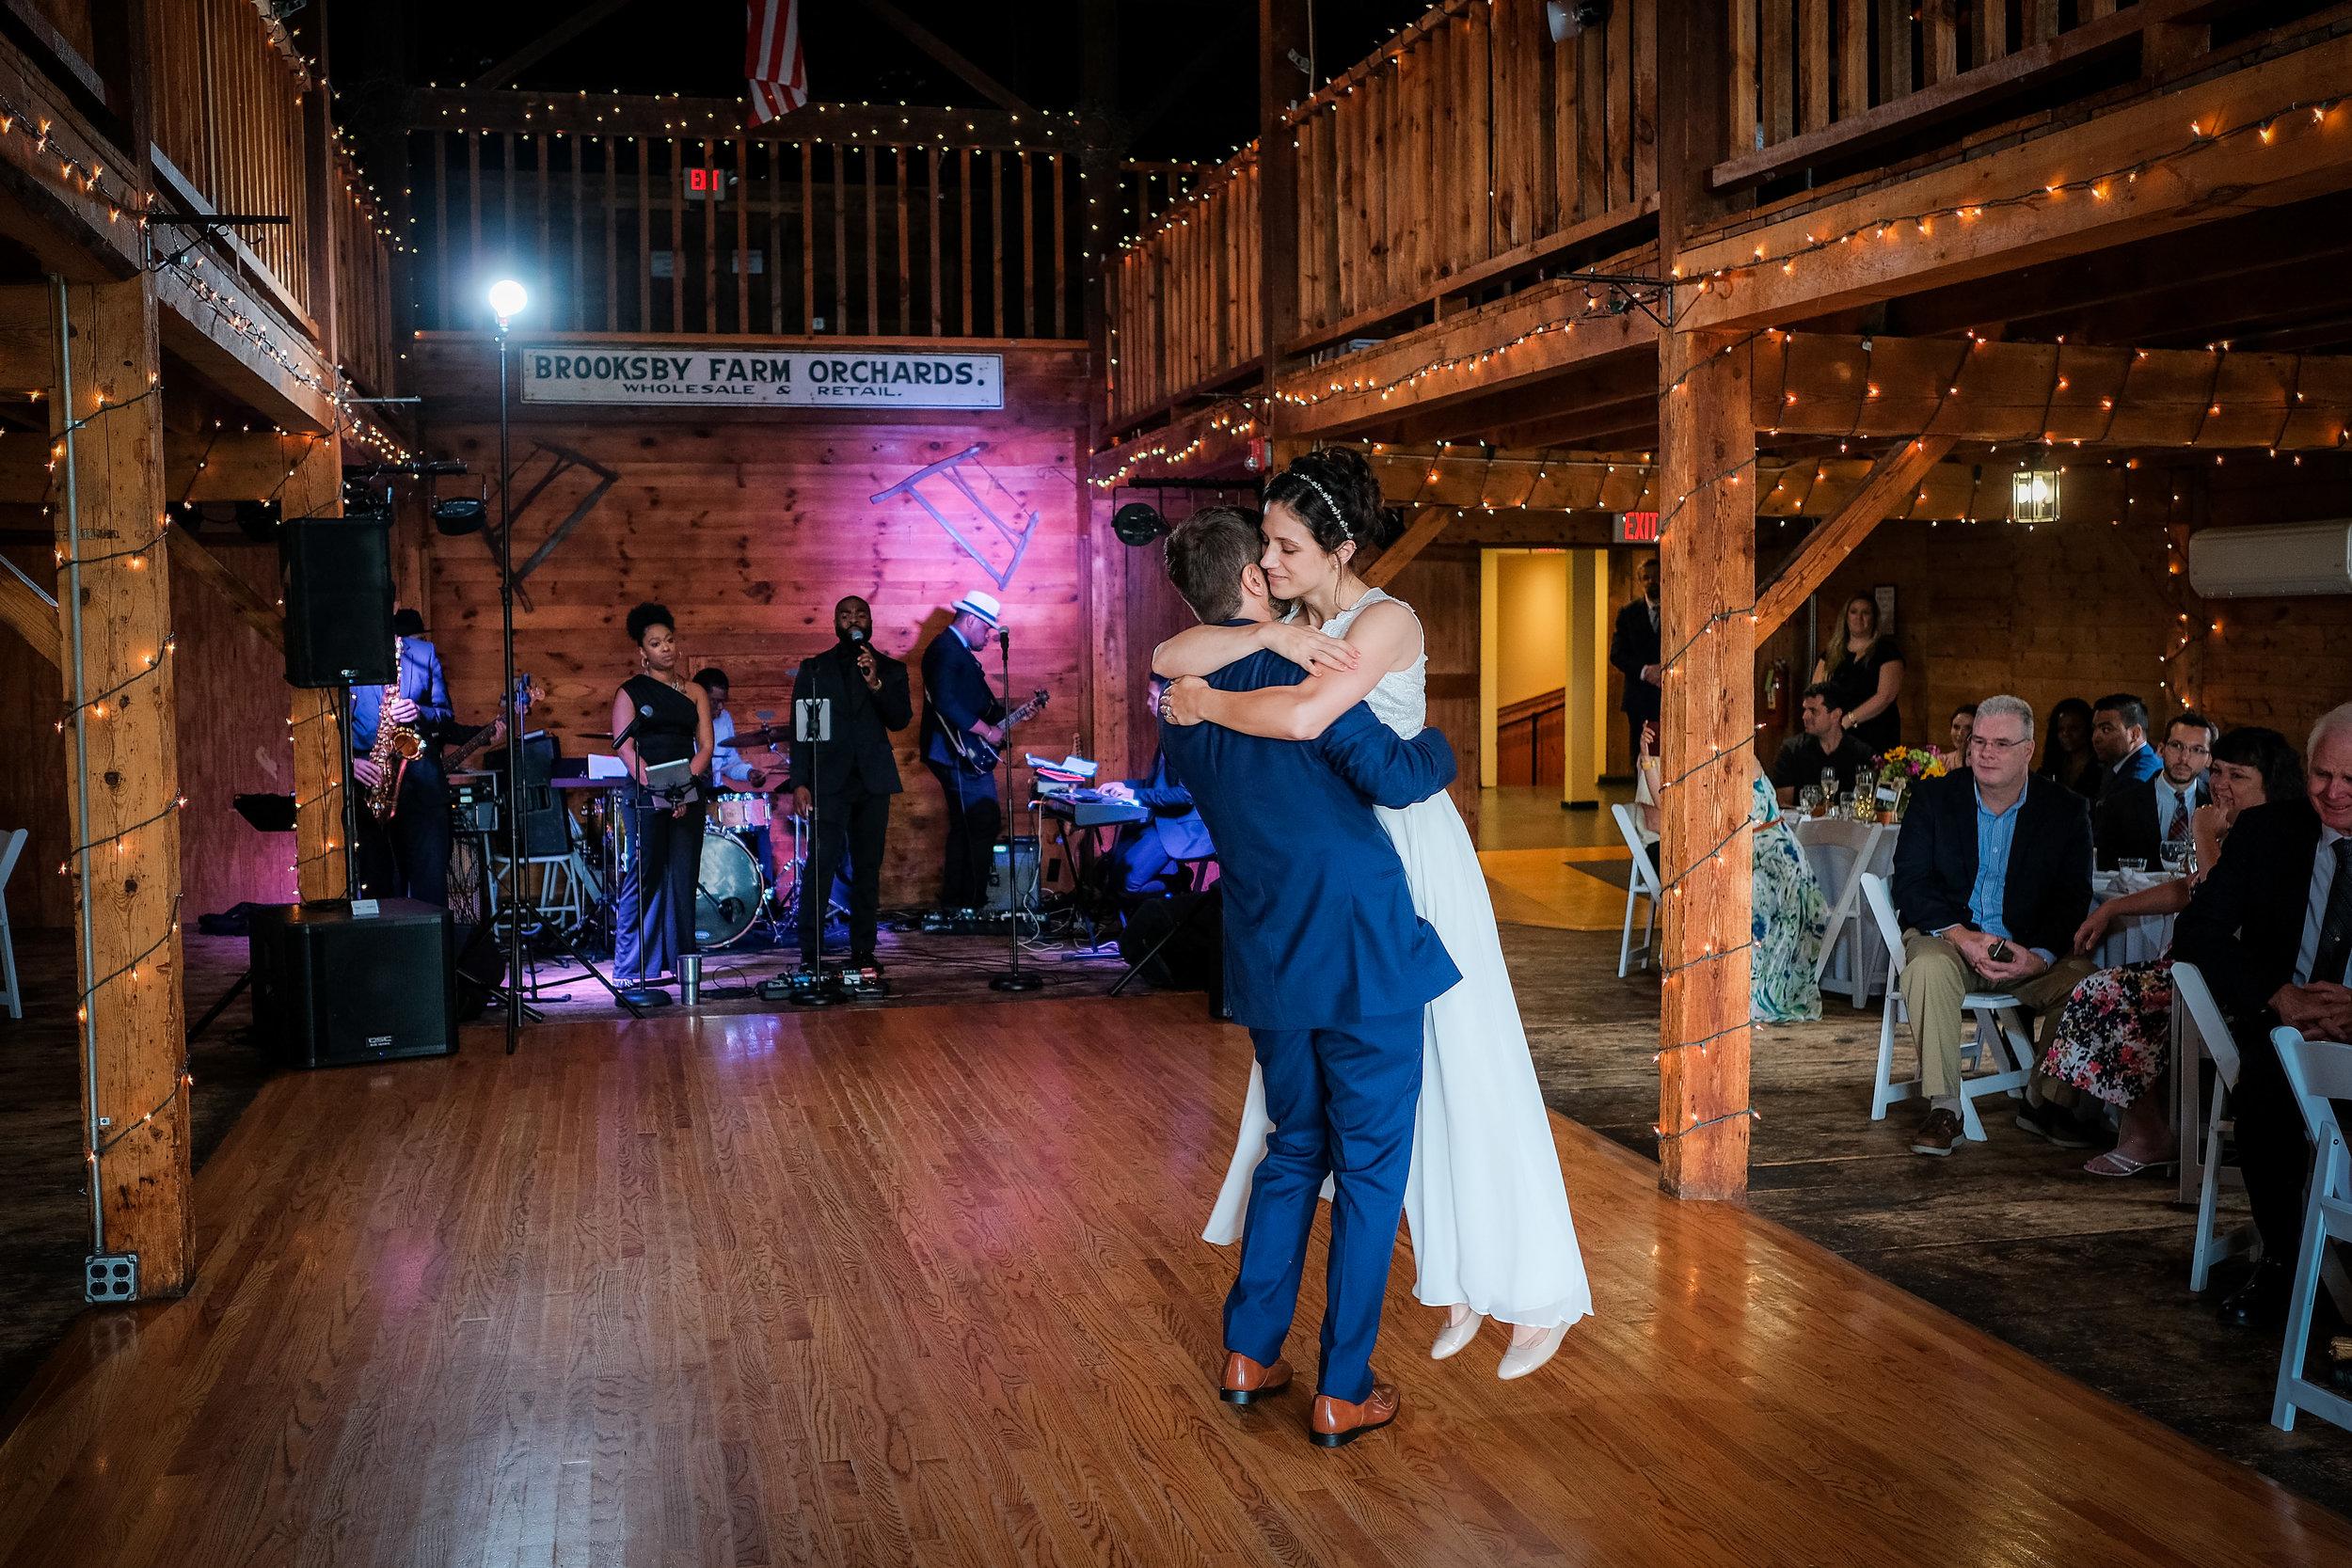 Peabody-Smith-Barn-Wedding-Photography-27.jpg